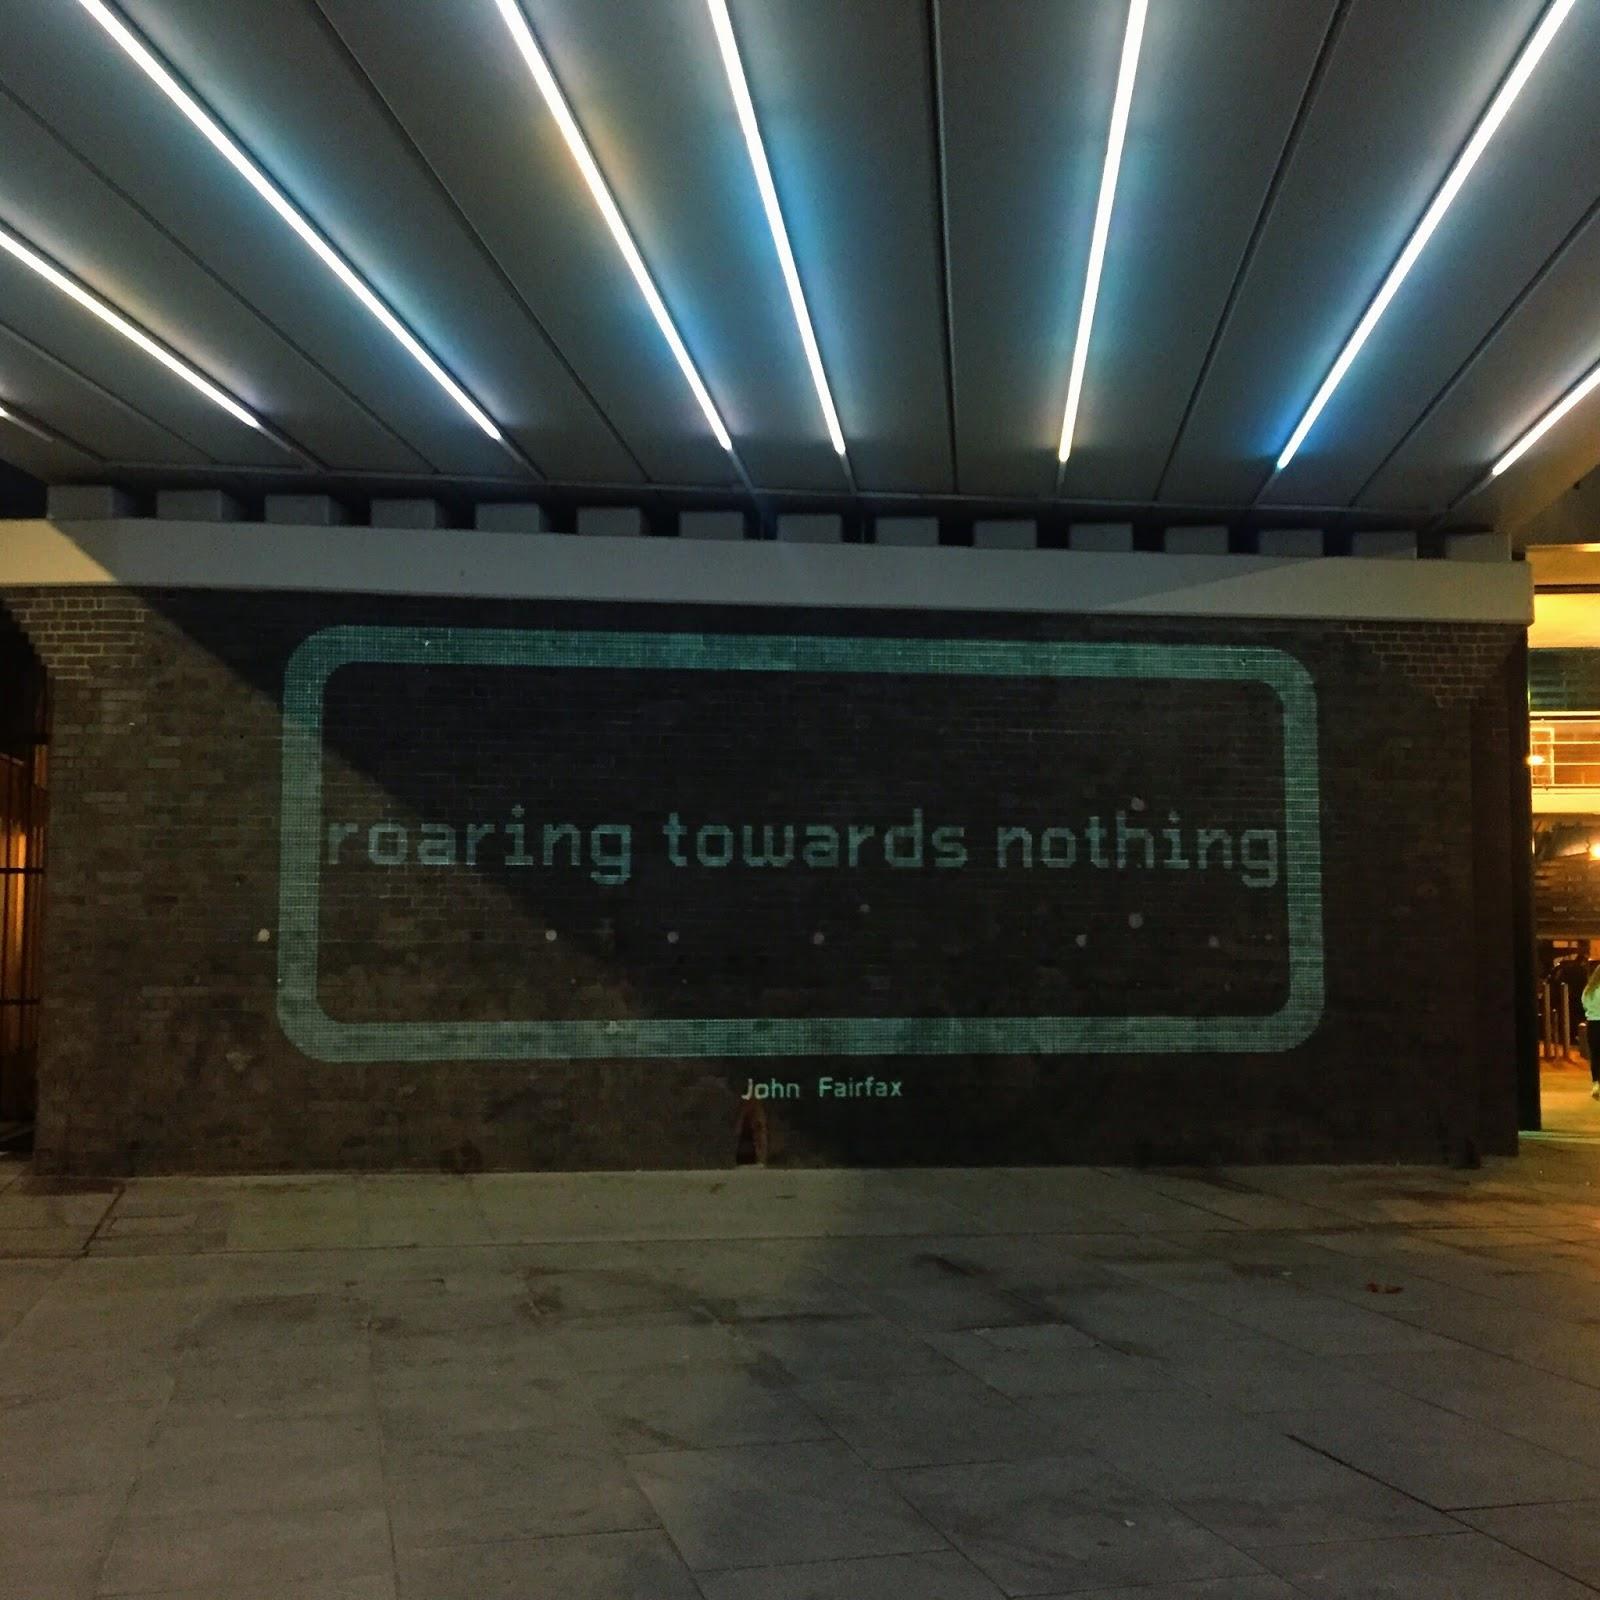 Line of Light: 'Roaring towards nothing' - John Fairfax.